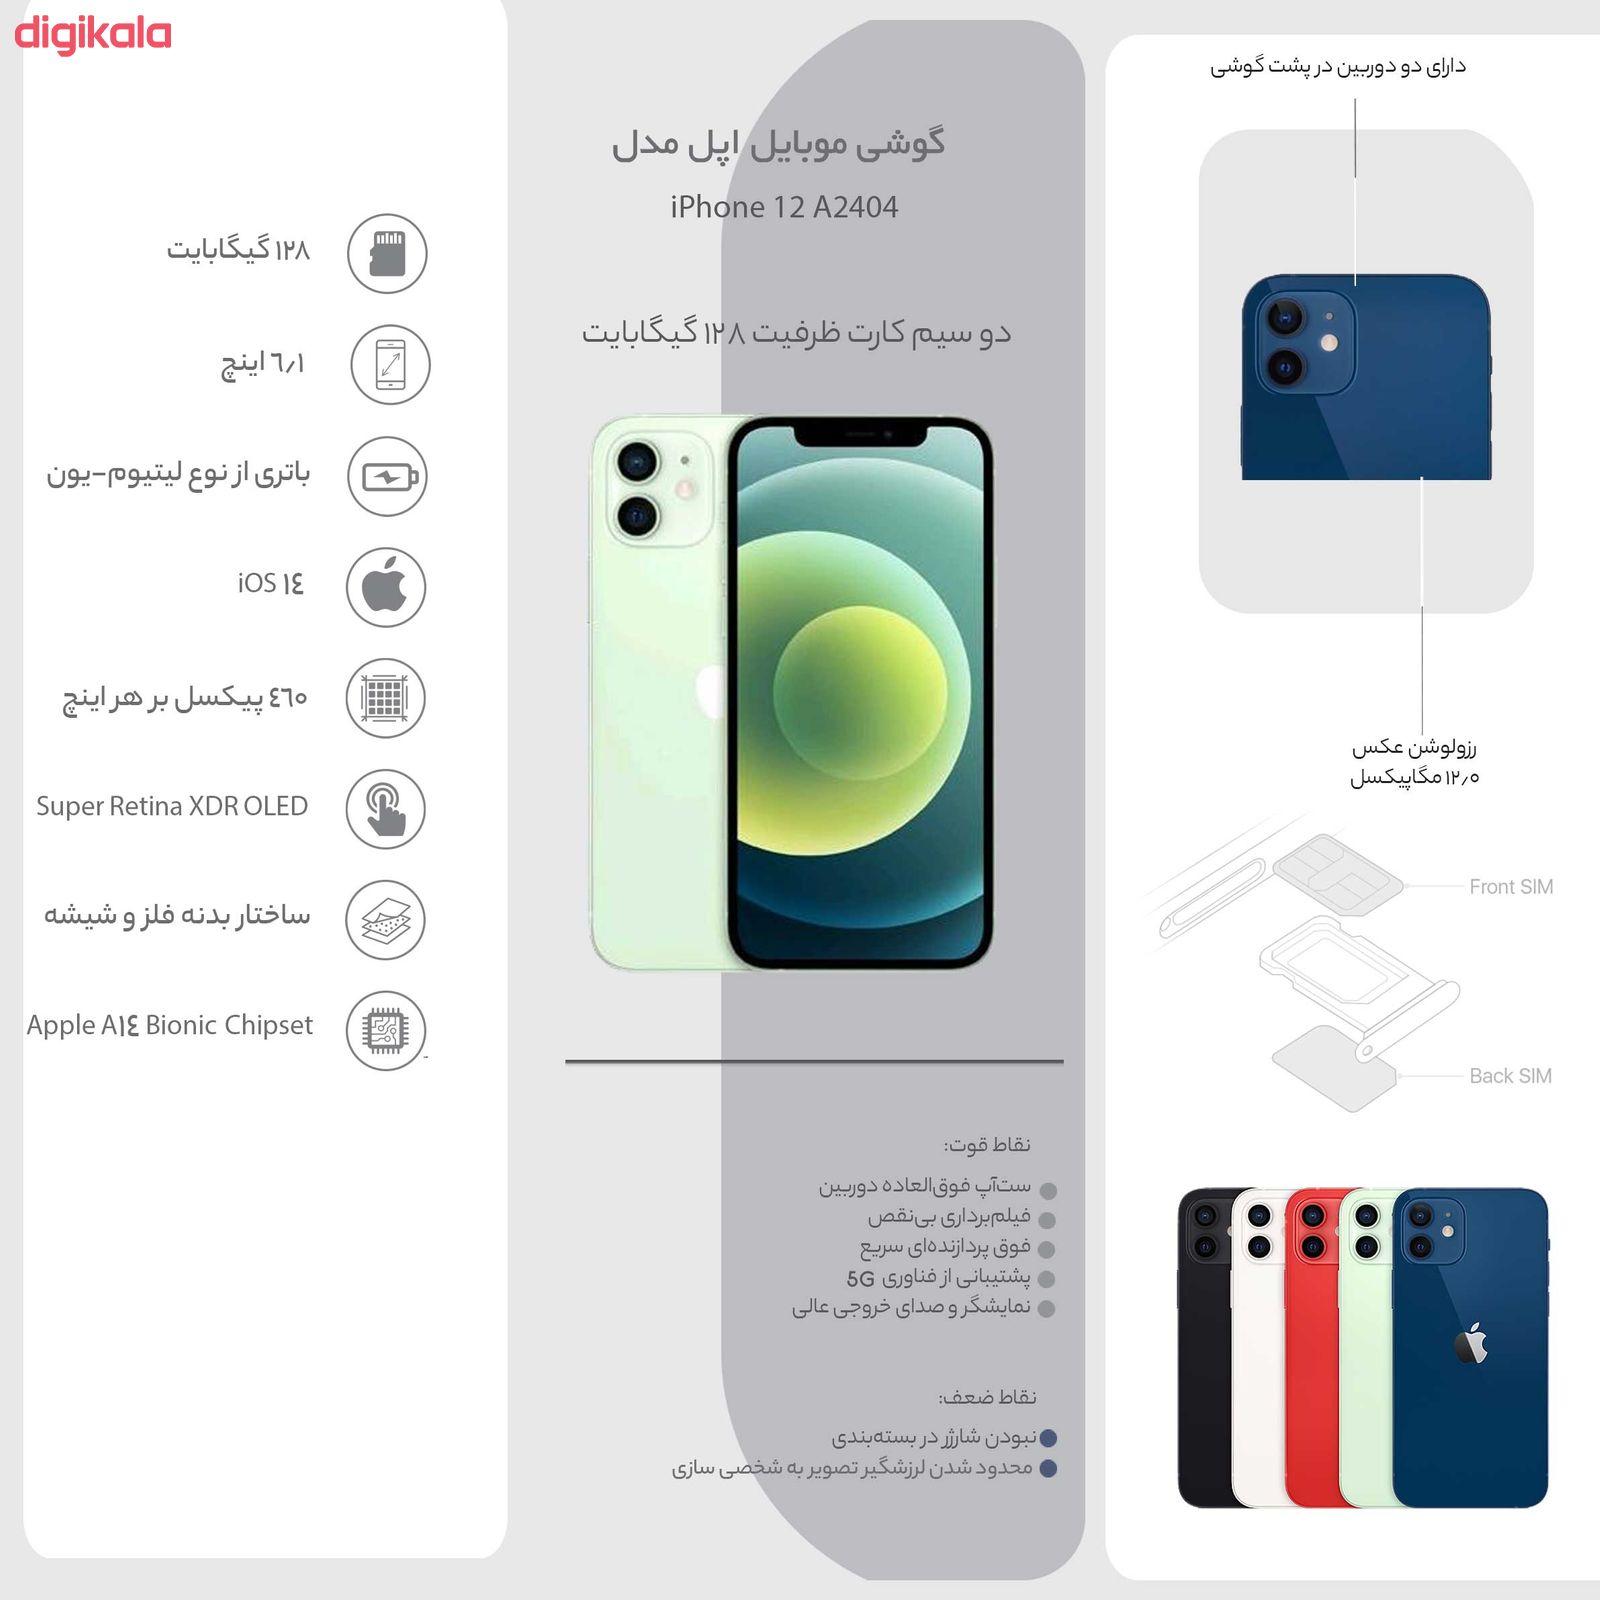 گوشی موبایل اپل مدل iPhone 12 A2404 دو سیم کارت ظرفیت 128 گیگابایت  main 1 17